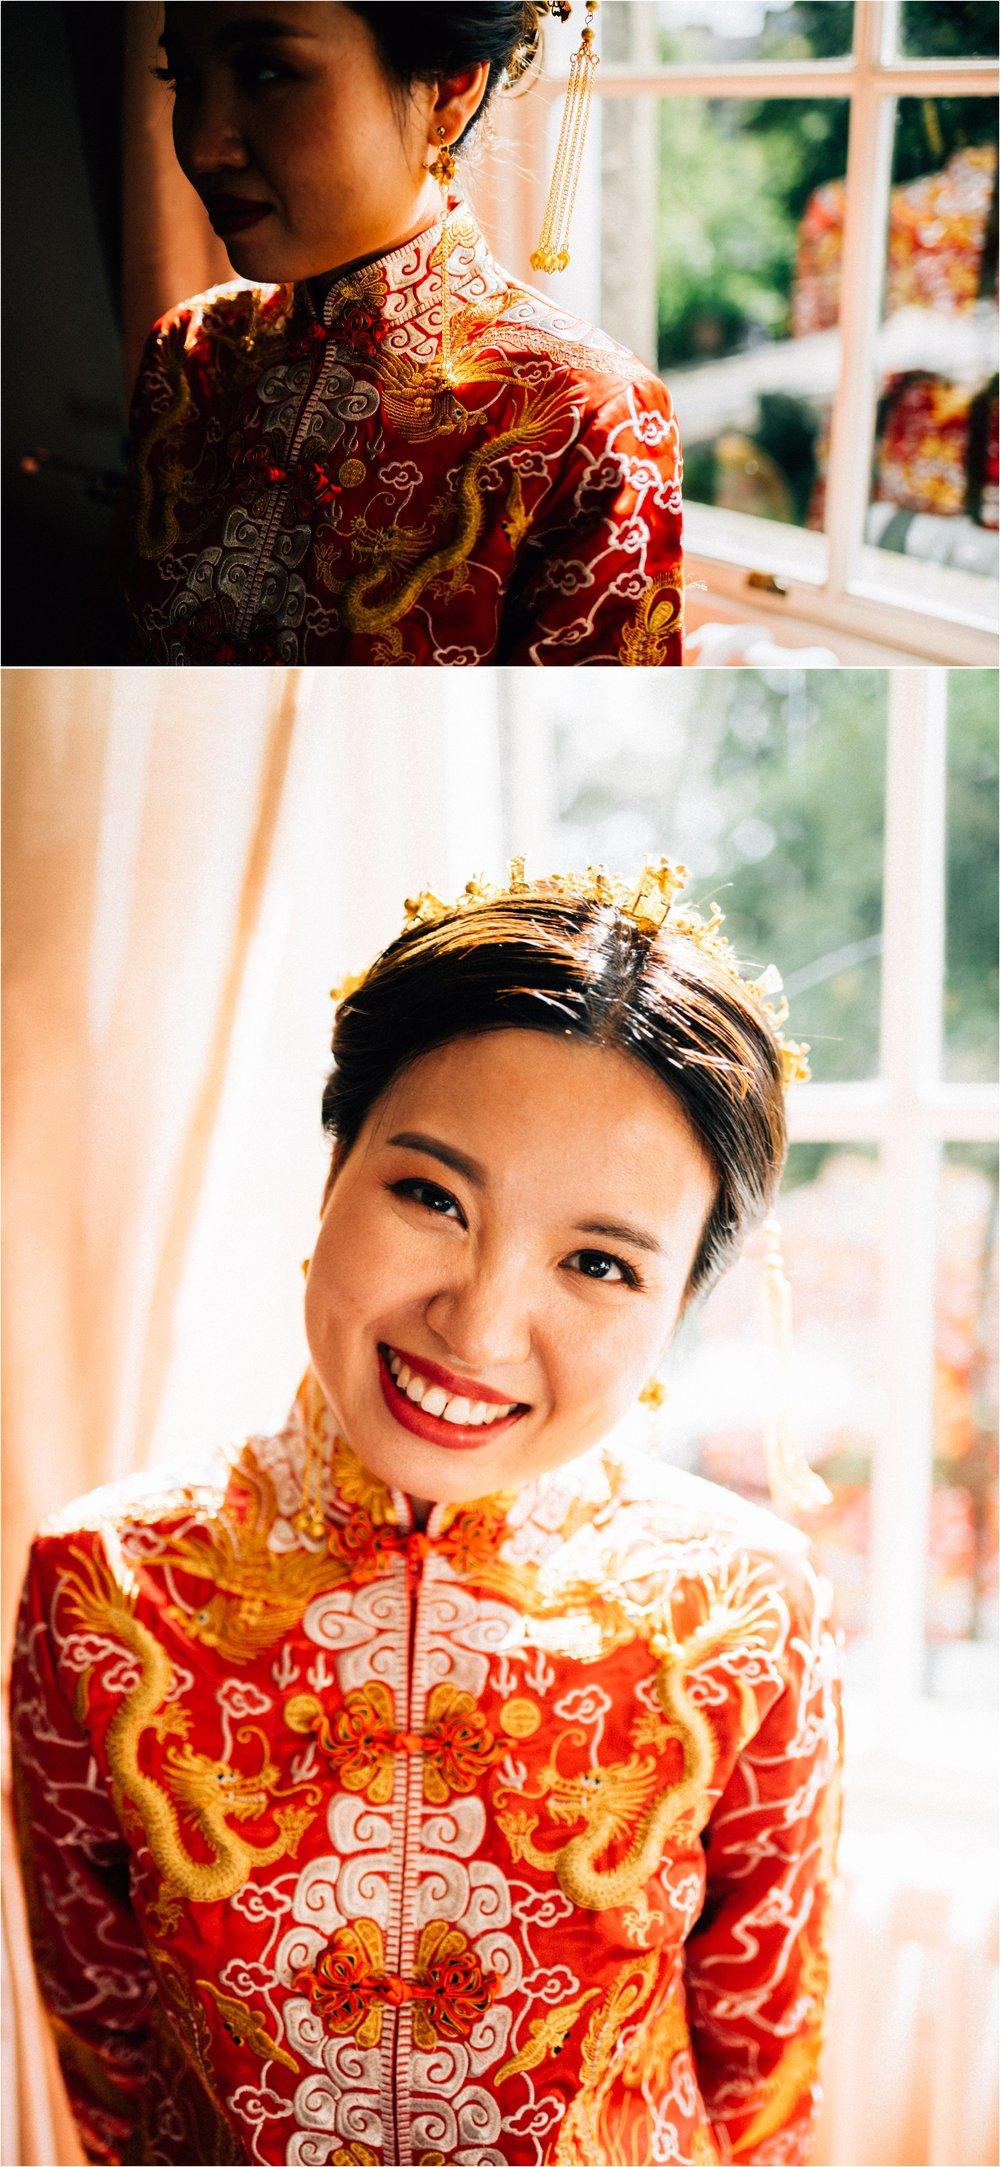 York city elopement wedding photographer_0172.jpg